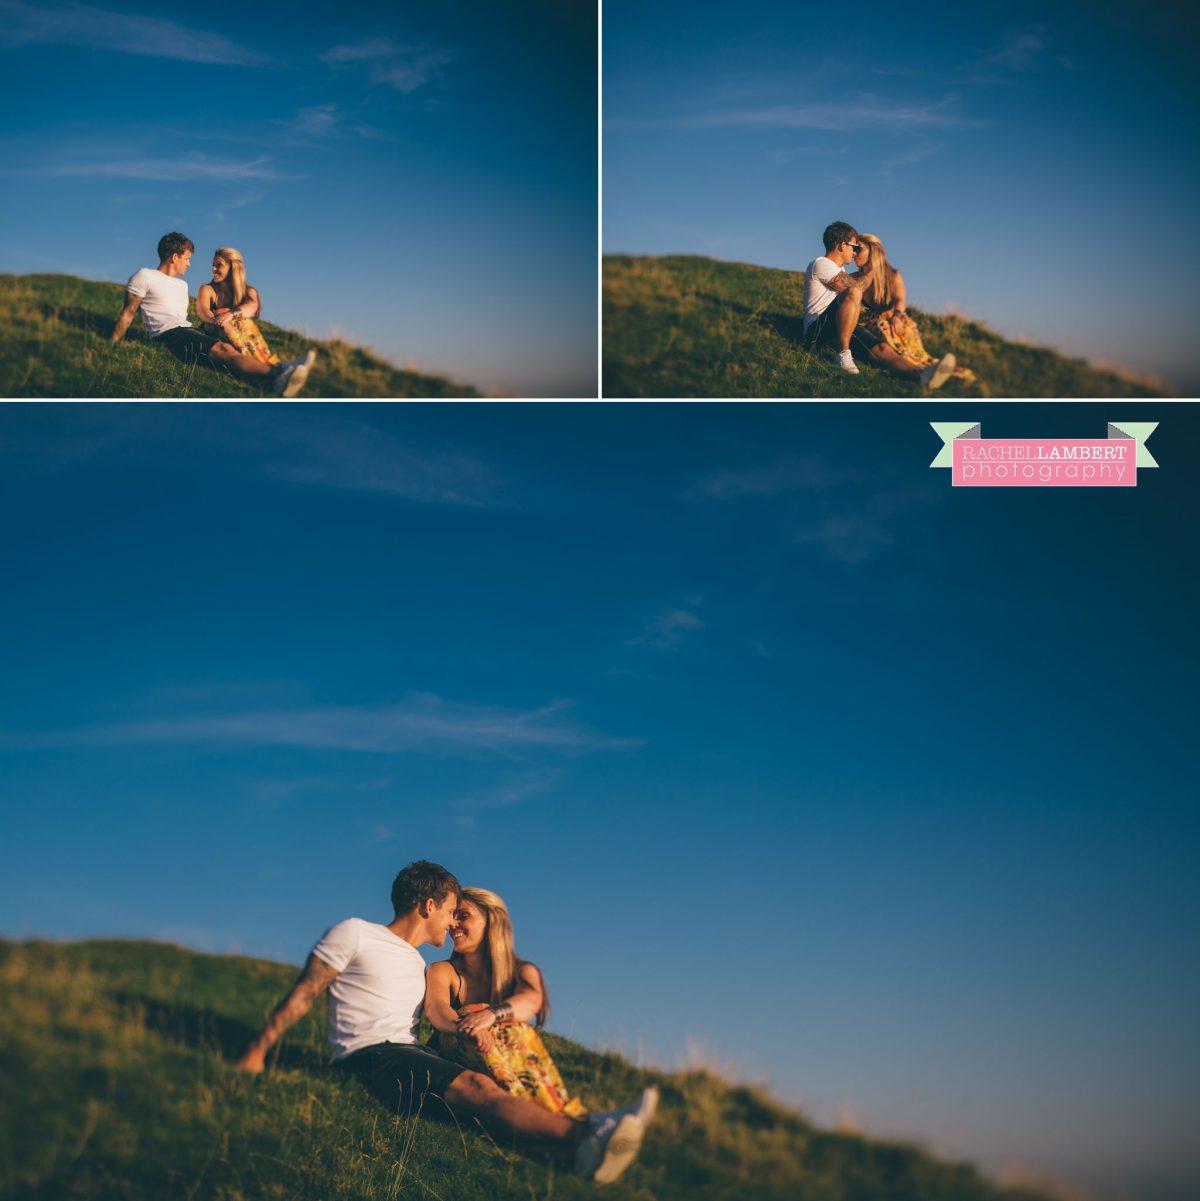 welsh_wedding_photographer_decourceys_rachel_lambert_photography_ceri_chris_engagement_shoot_garth_mountain_ 7